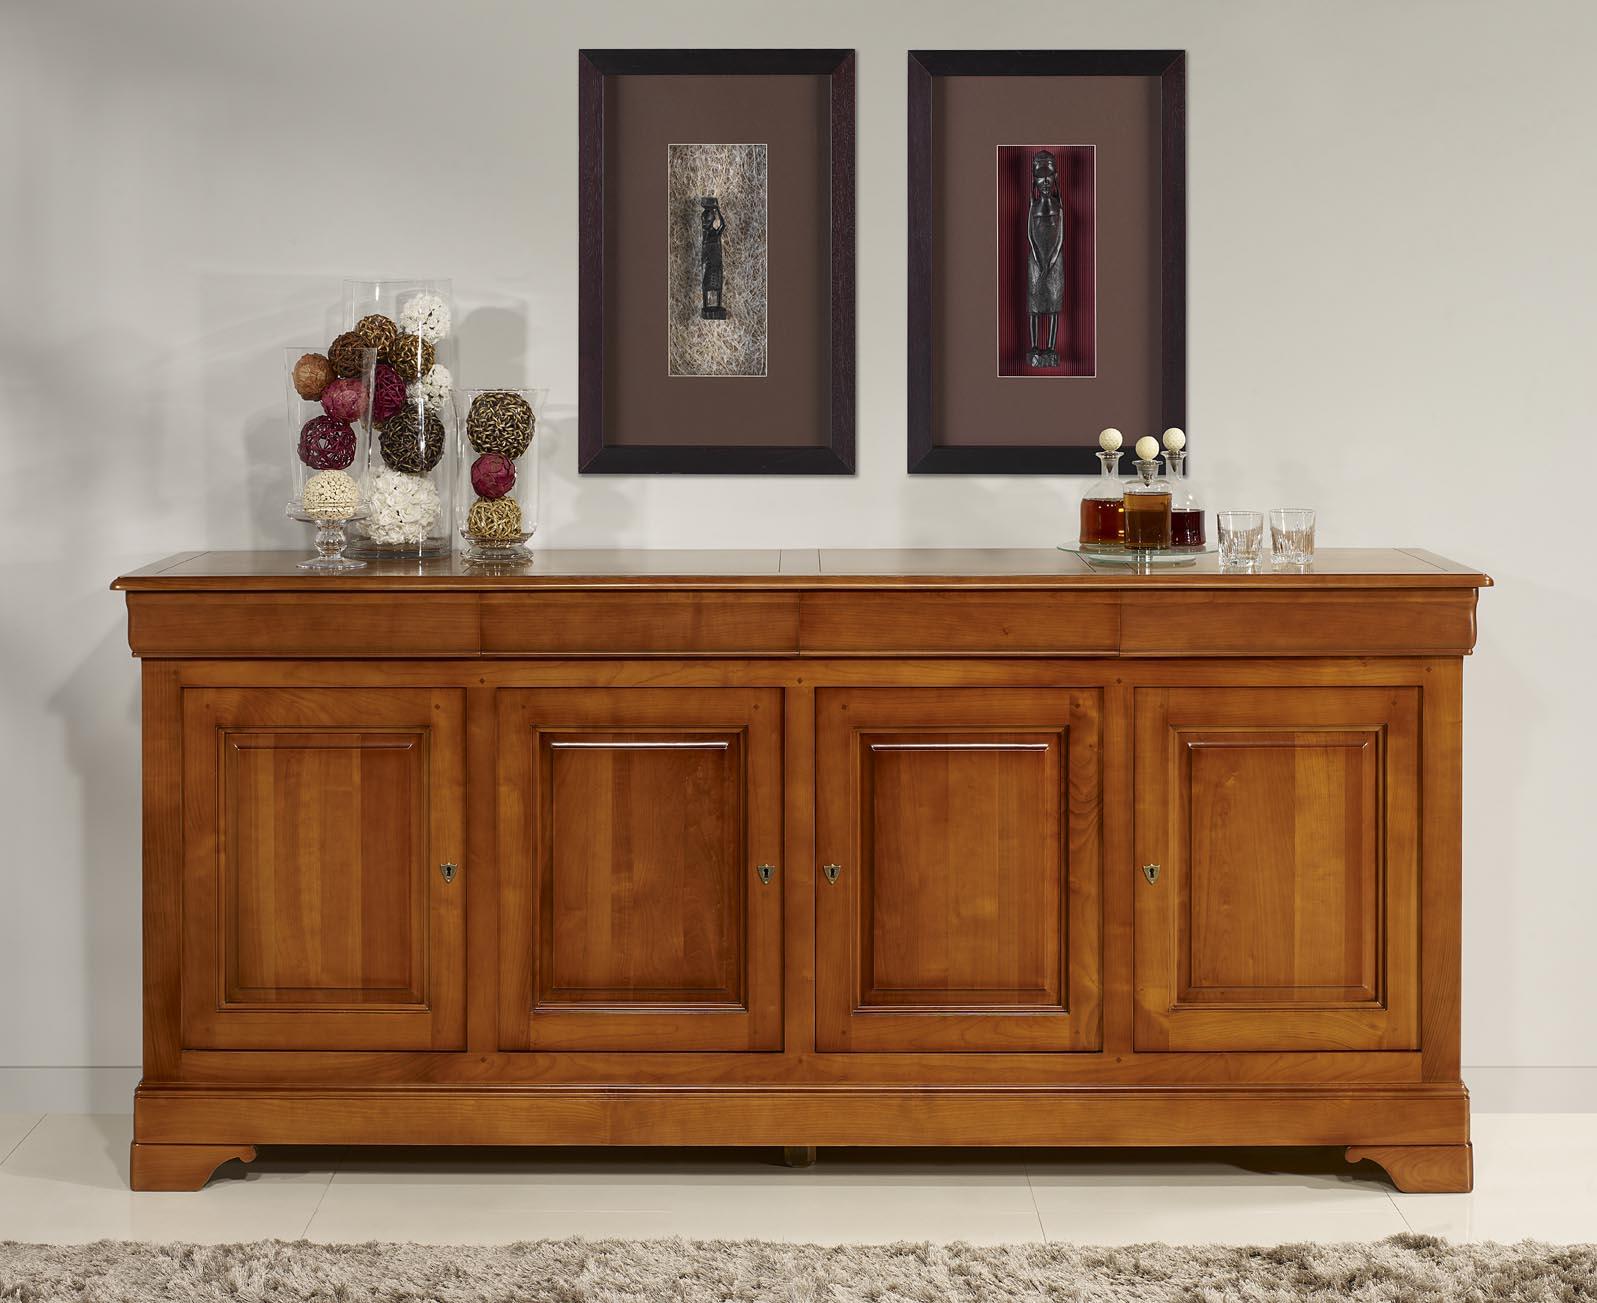 aparador buffet 4 puertas laura hecha en cerezo macizo estilo louis philippe meuble en merisier. Black Bedroom Furniture Sets. Home Design Ideas